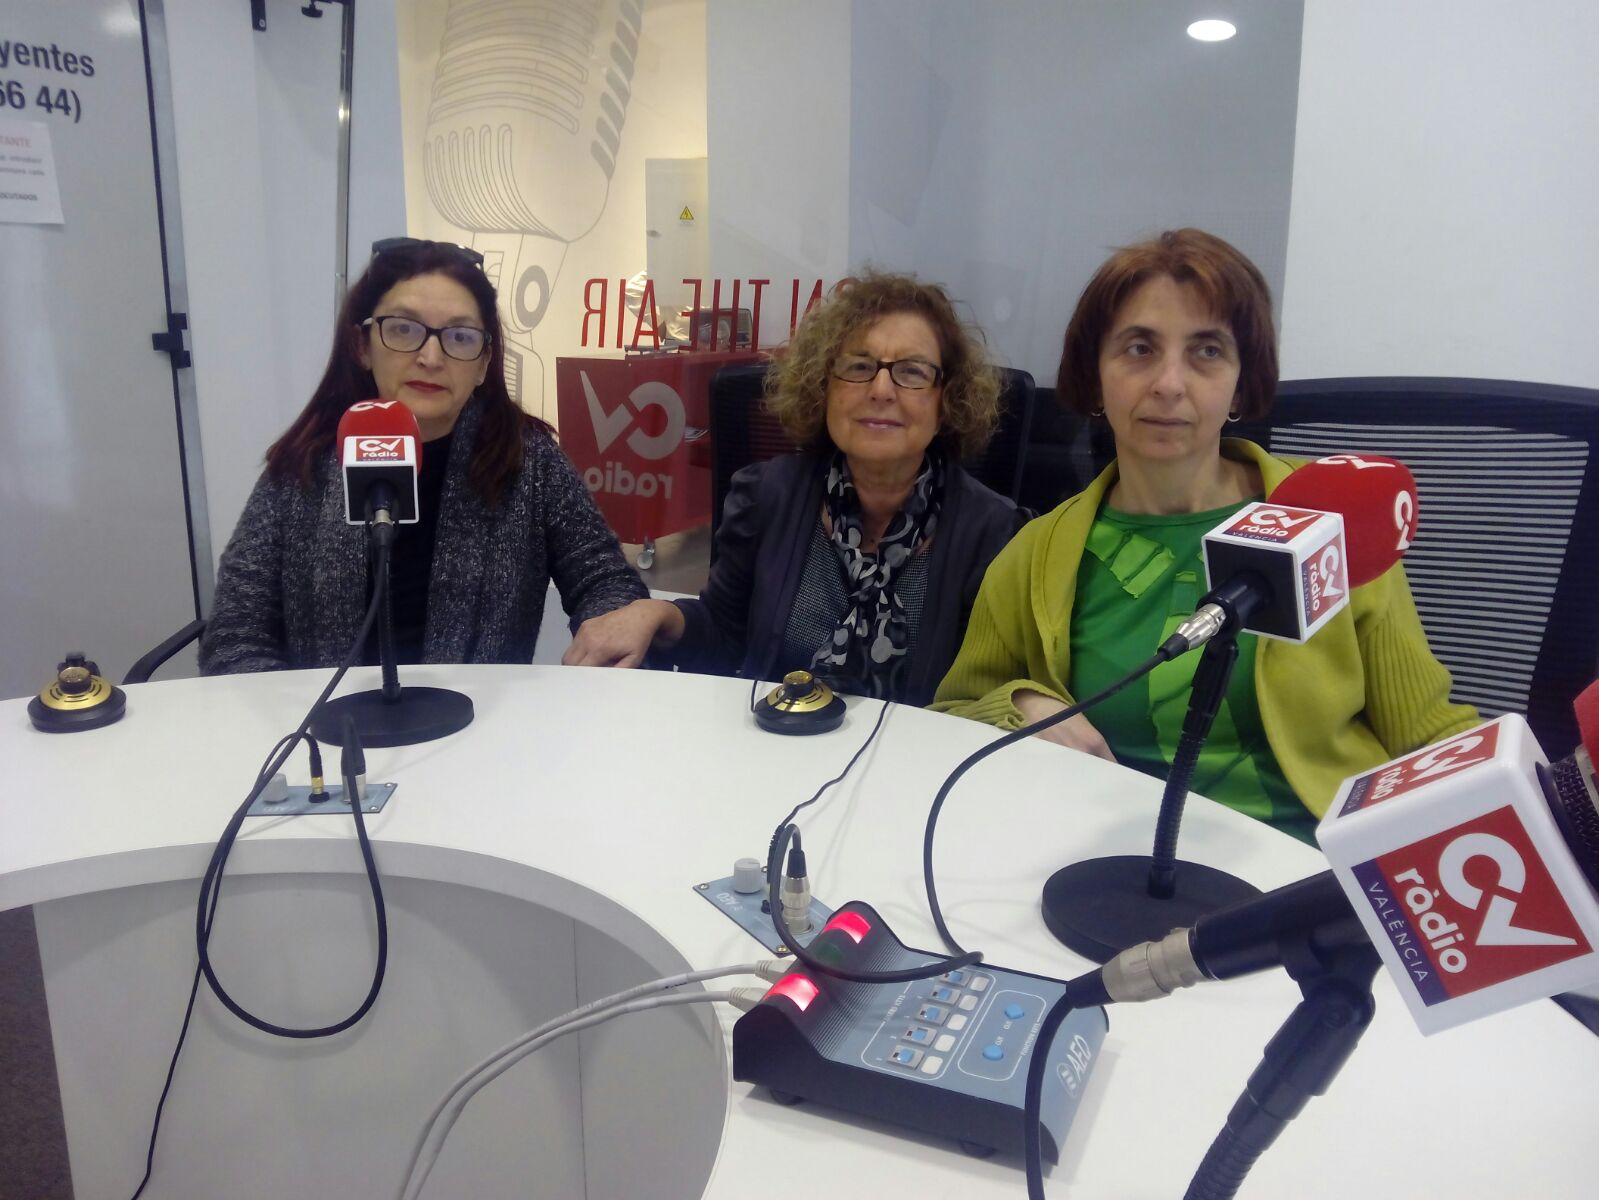 CV Radio Fiebre Mediterránea Familiar